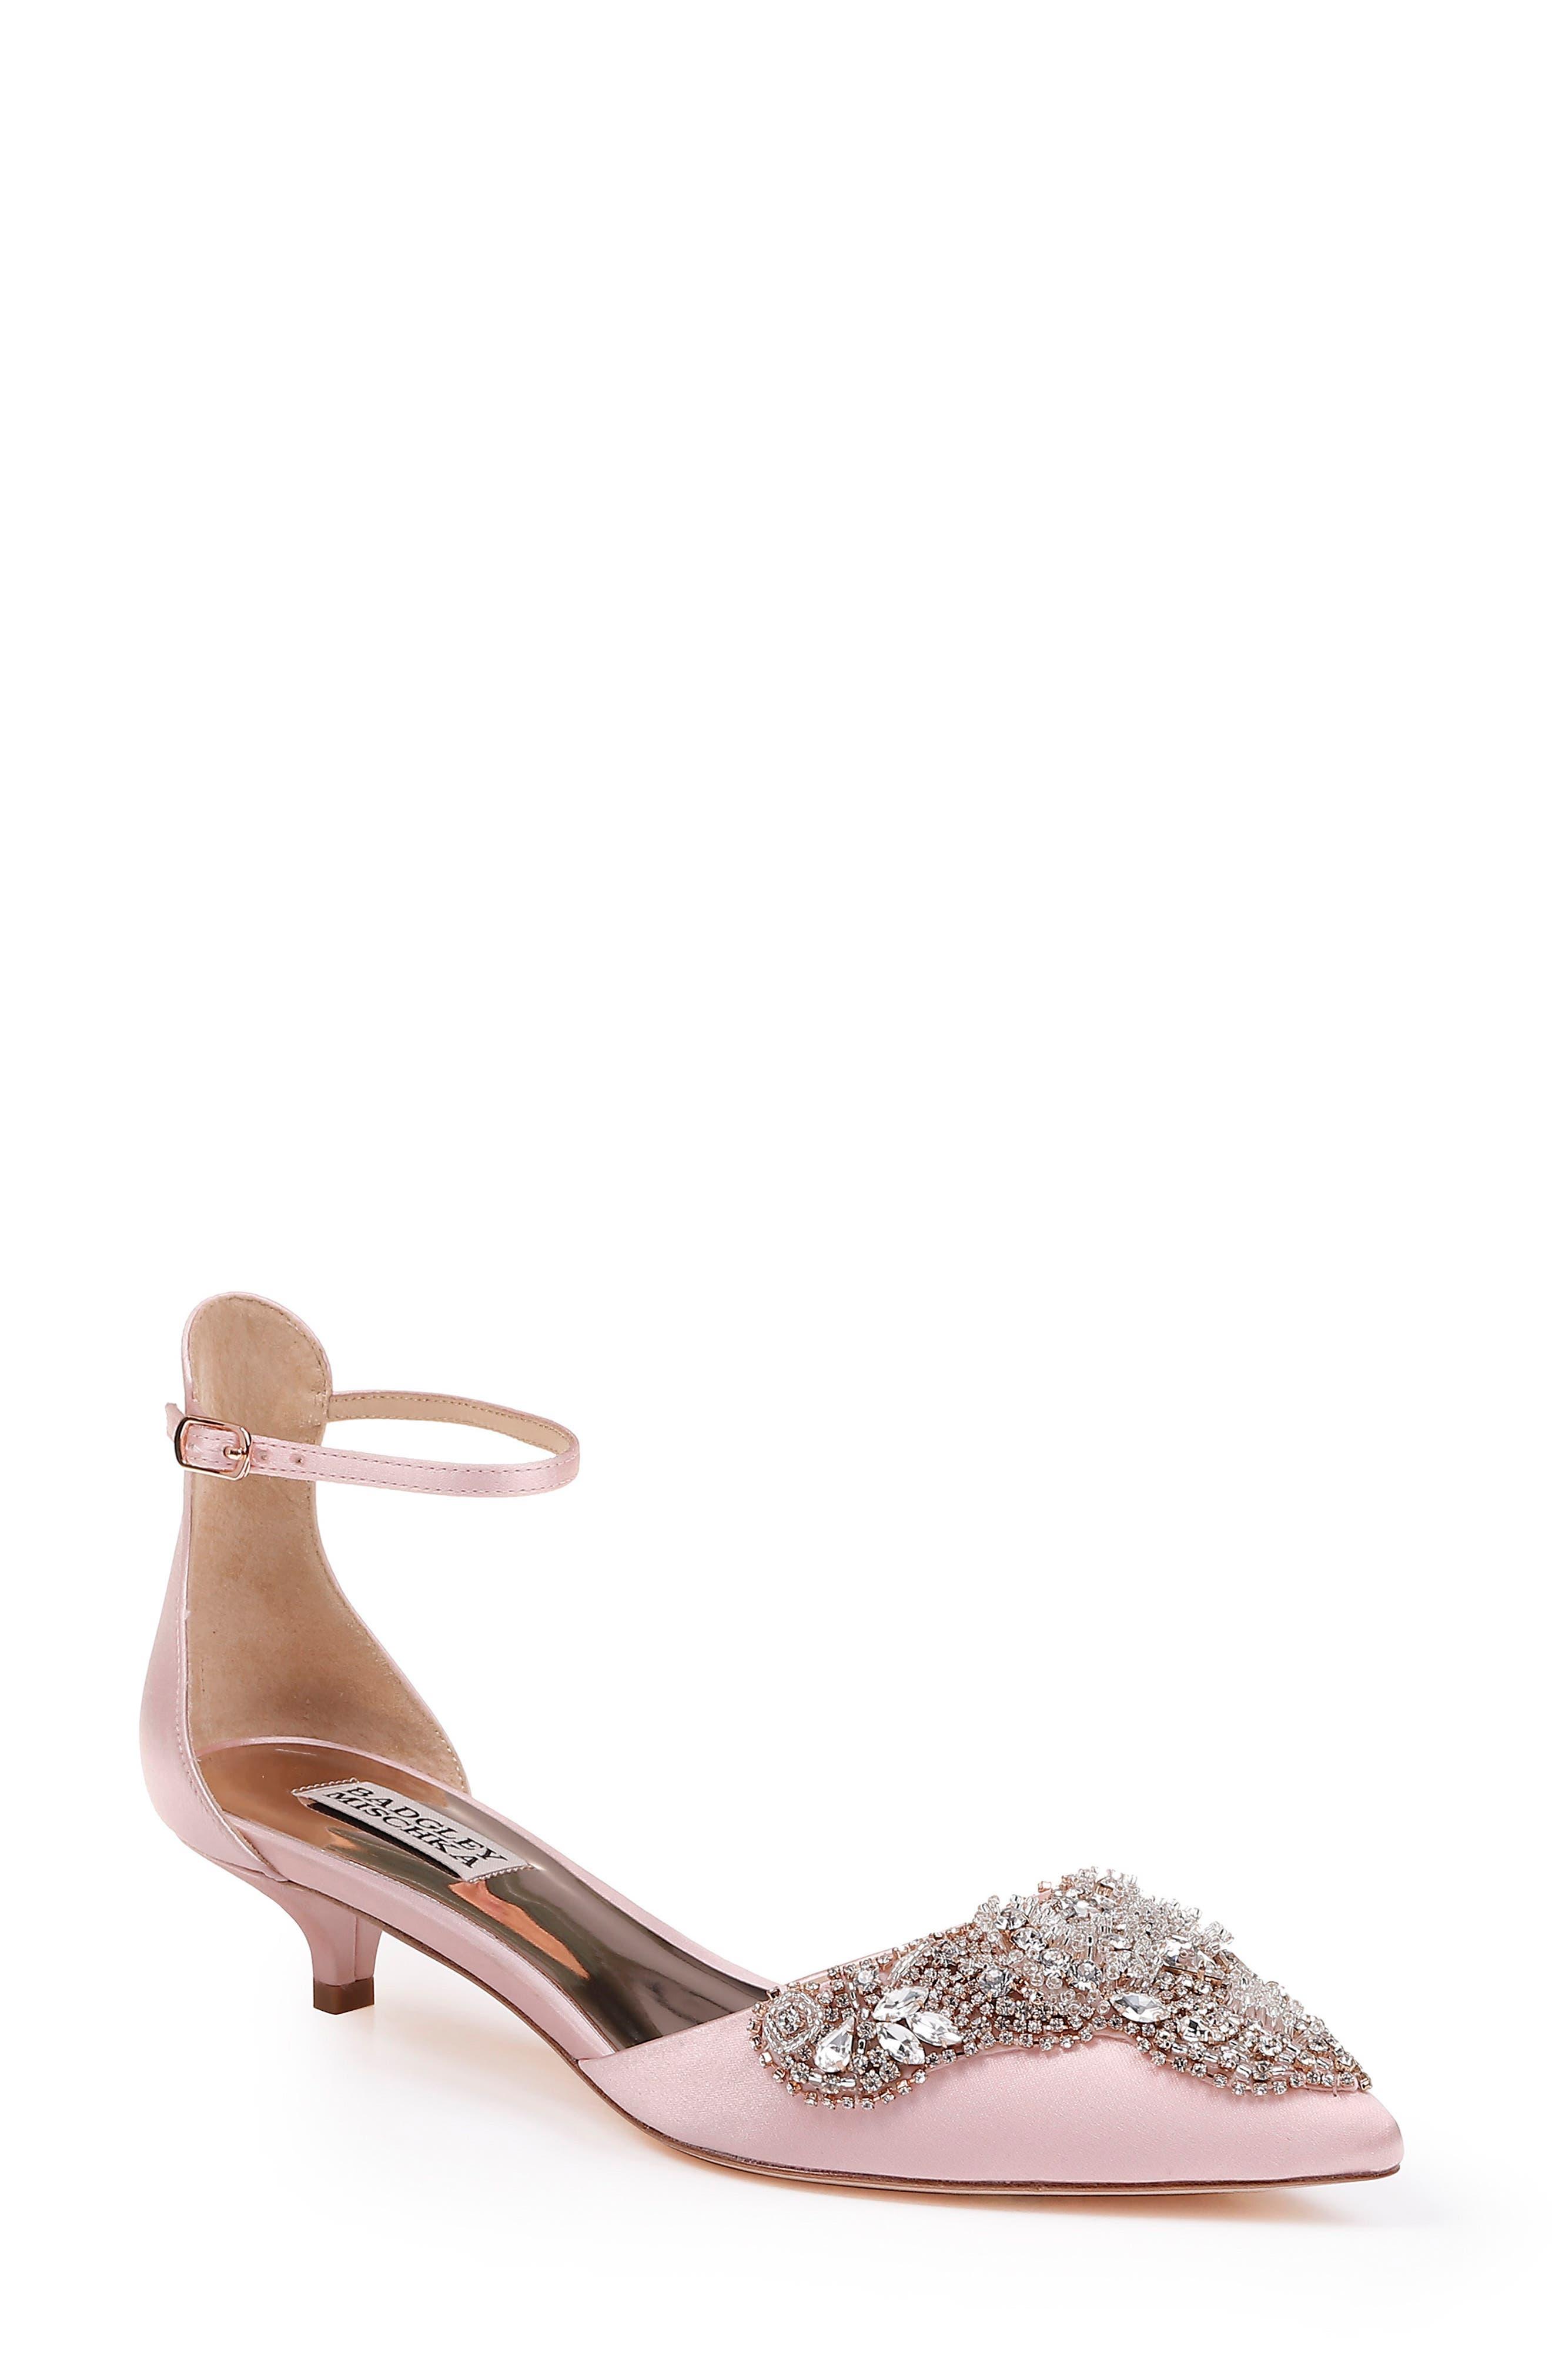 Badgley Mischka Fiana Ankle Strap Pump- Pink